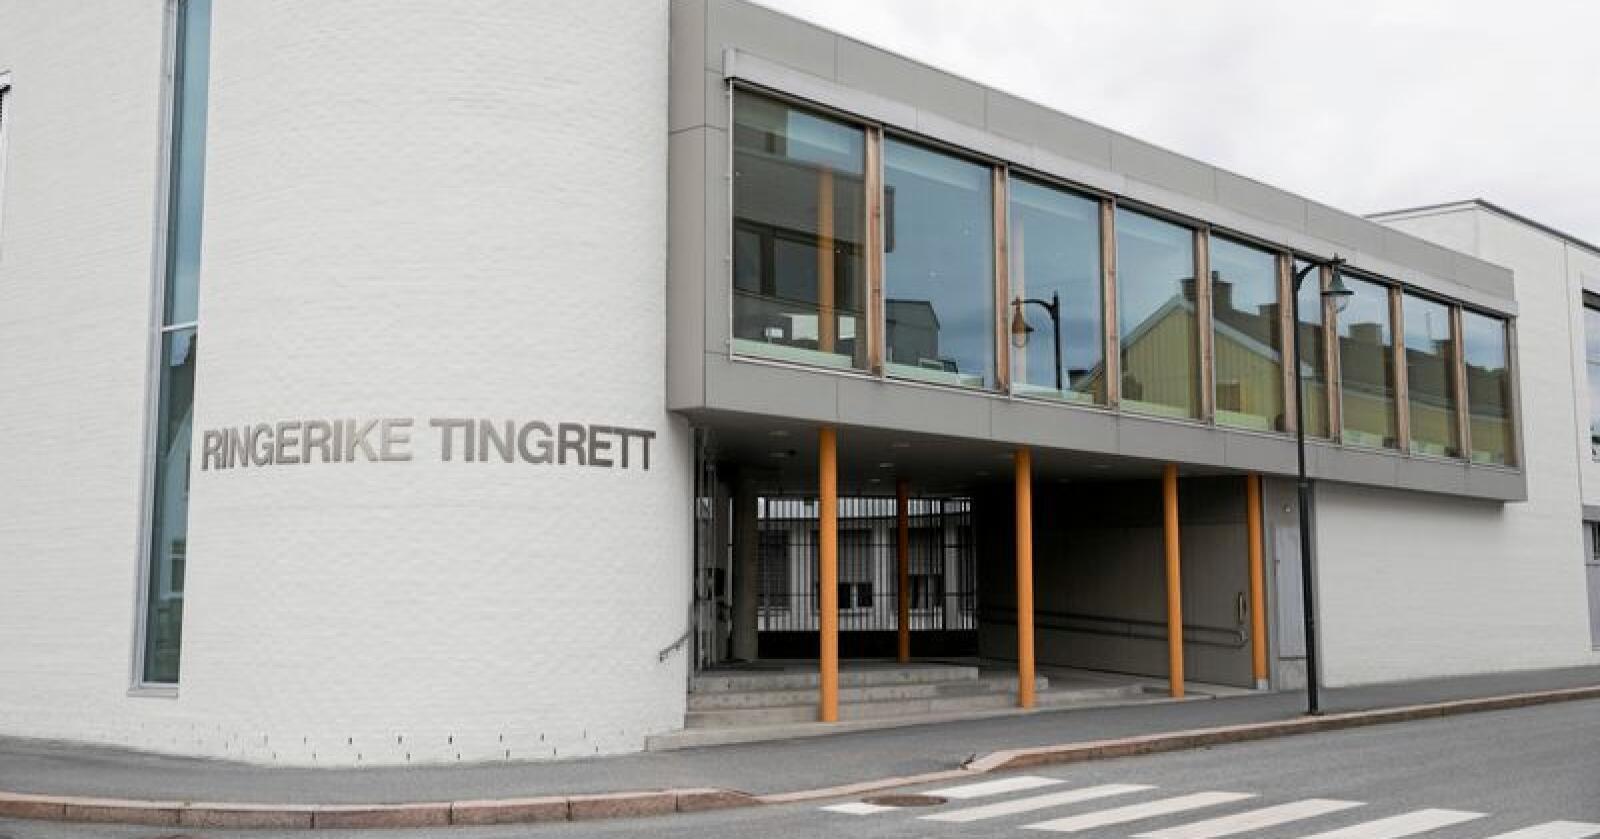 Dommen mot de to mennene falt i Ringerike tingrett. Foto: Terje Bendiksby / NTB scanpix